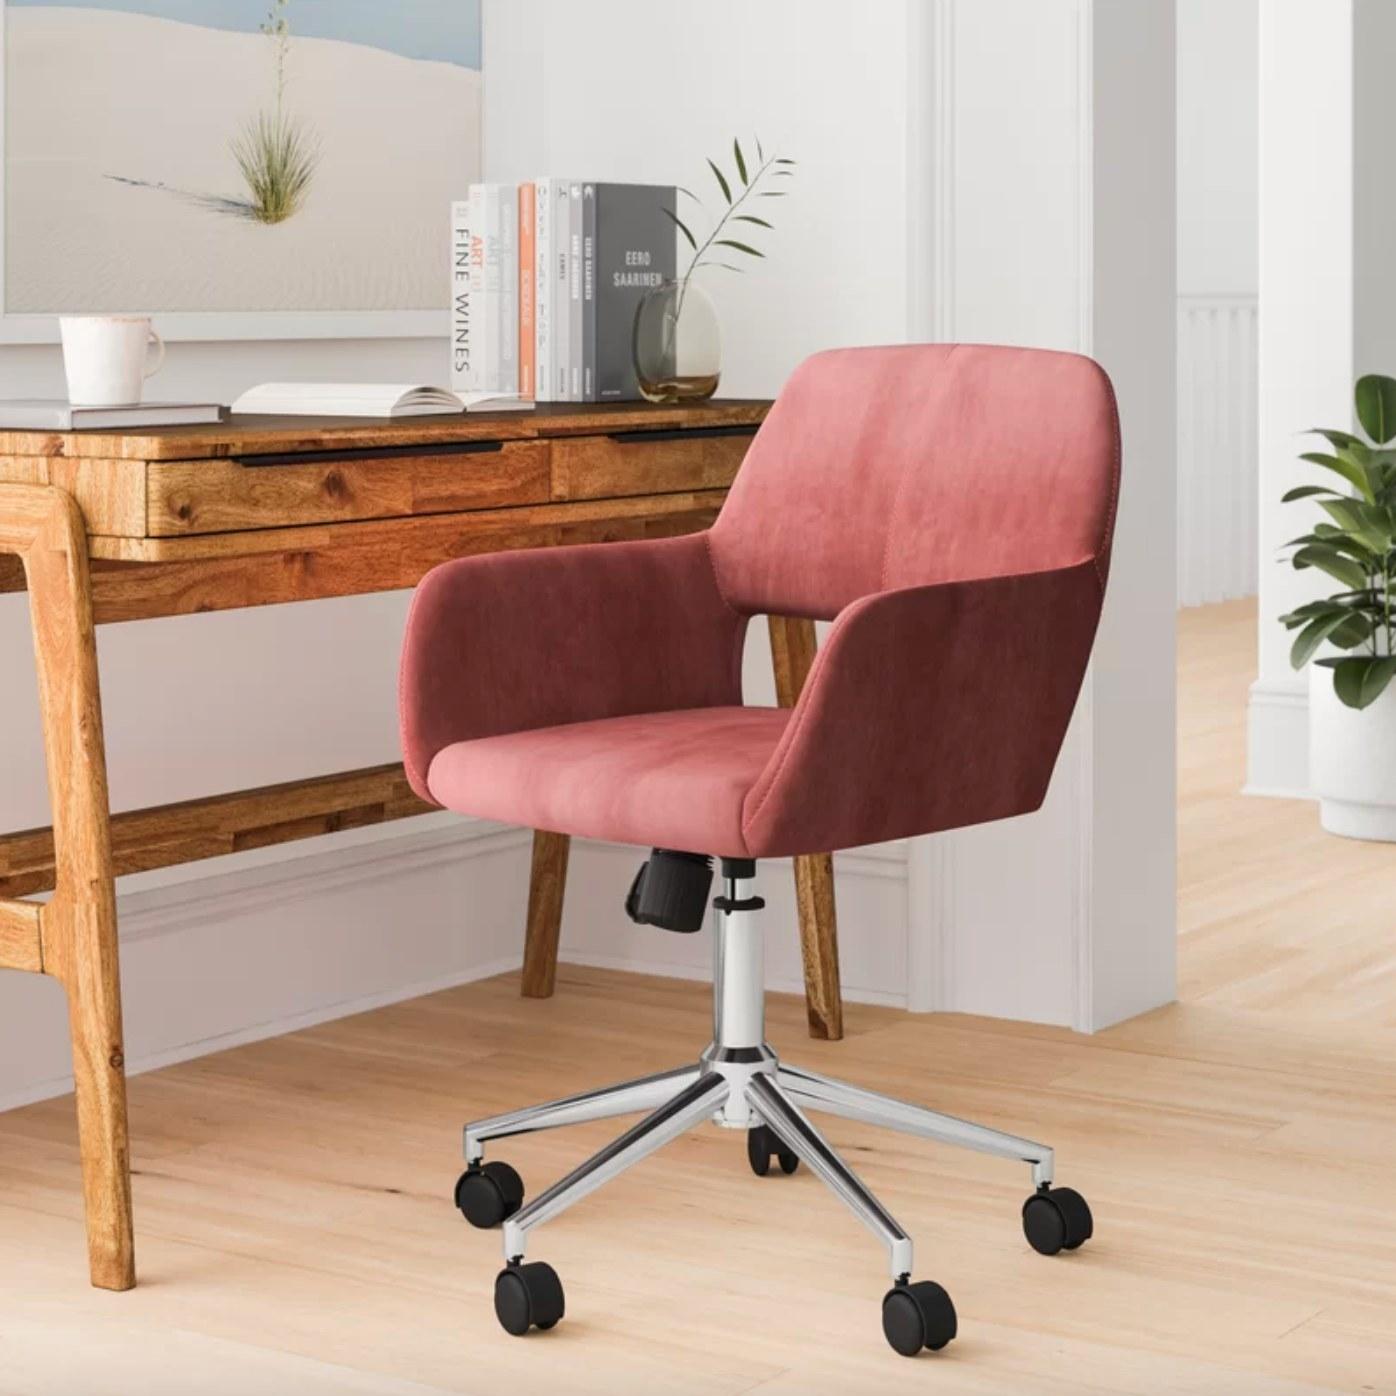 The velvet task chair with rose upholstery and chrome legs